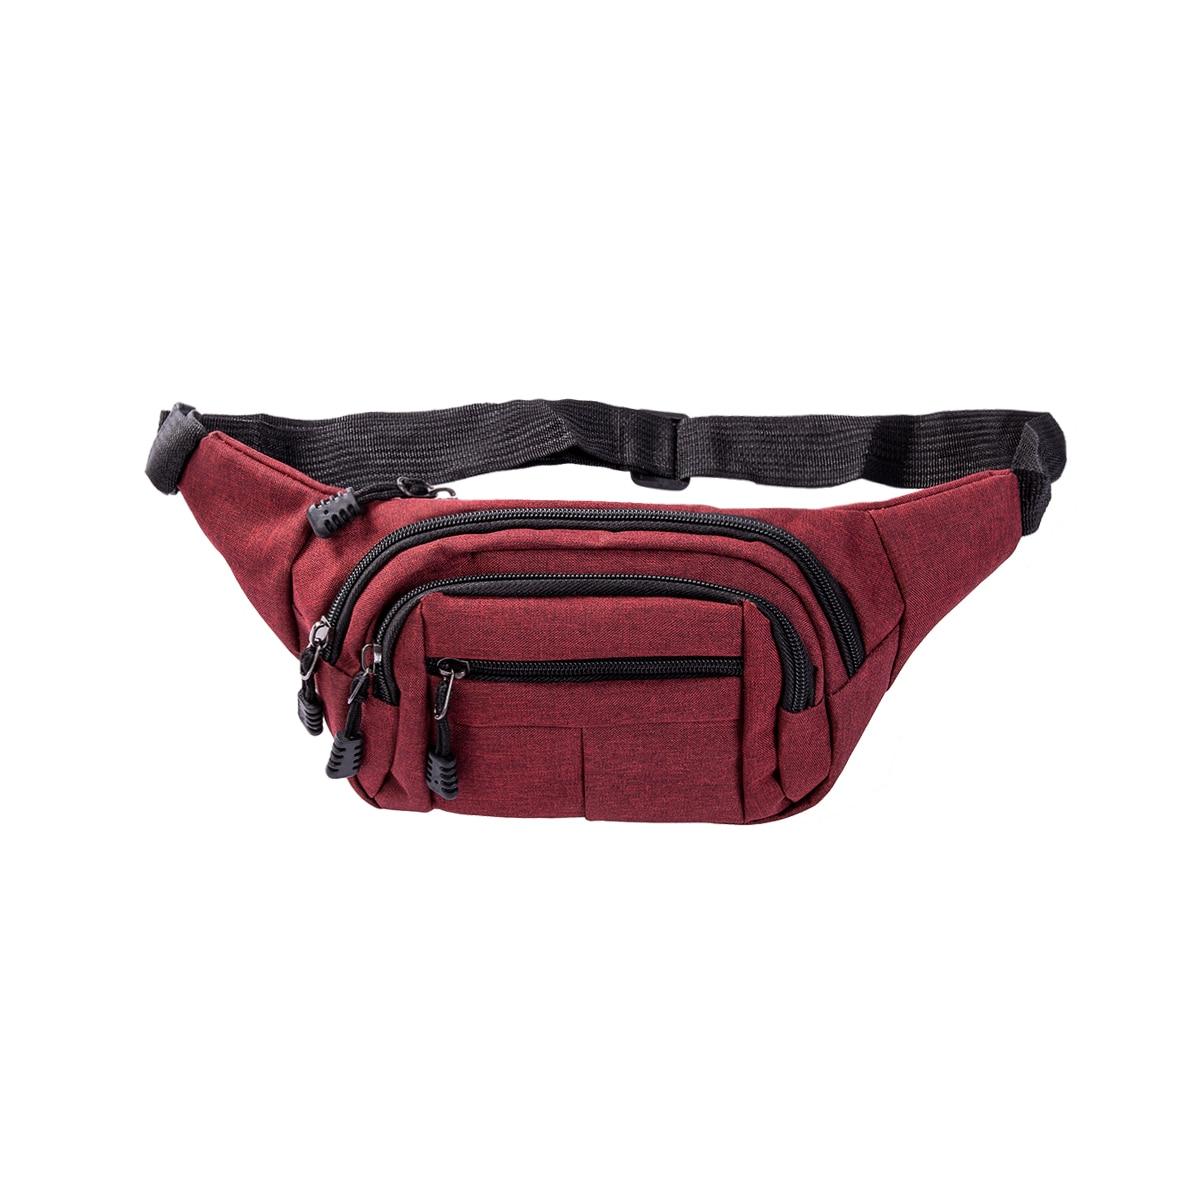 Travel Bum Bag Fanny Pack Waist Bag Zipped Outdoor Sports Shoulder Bag Pouch A++